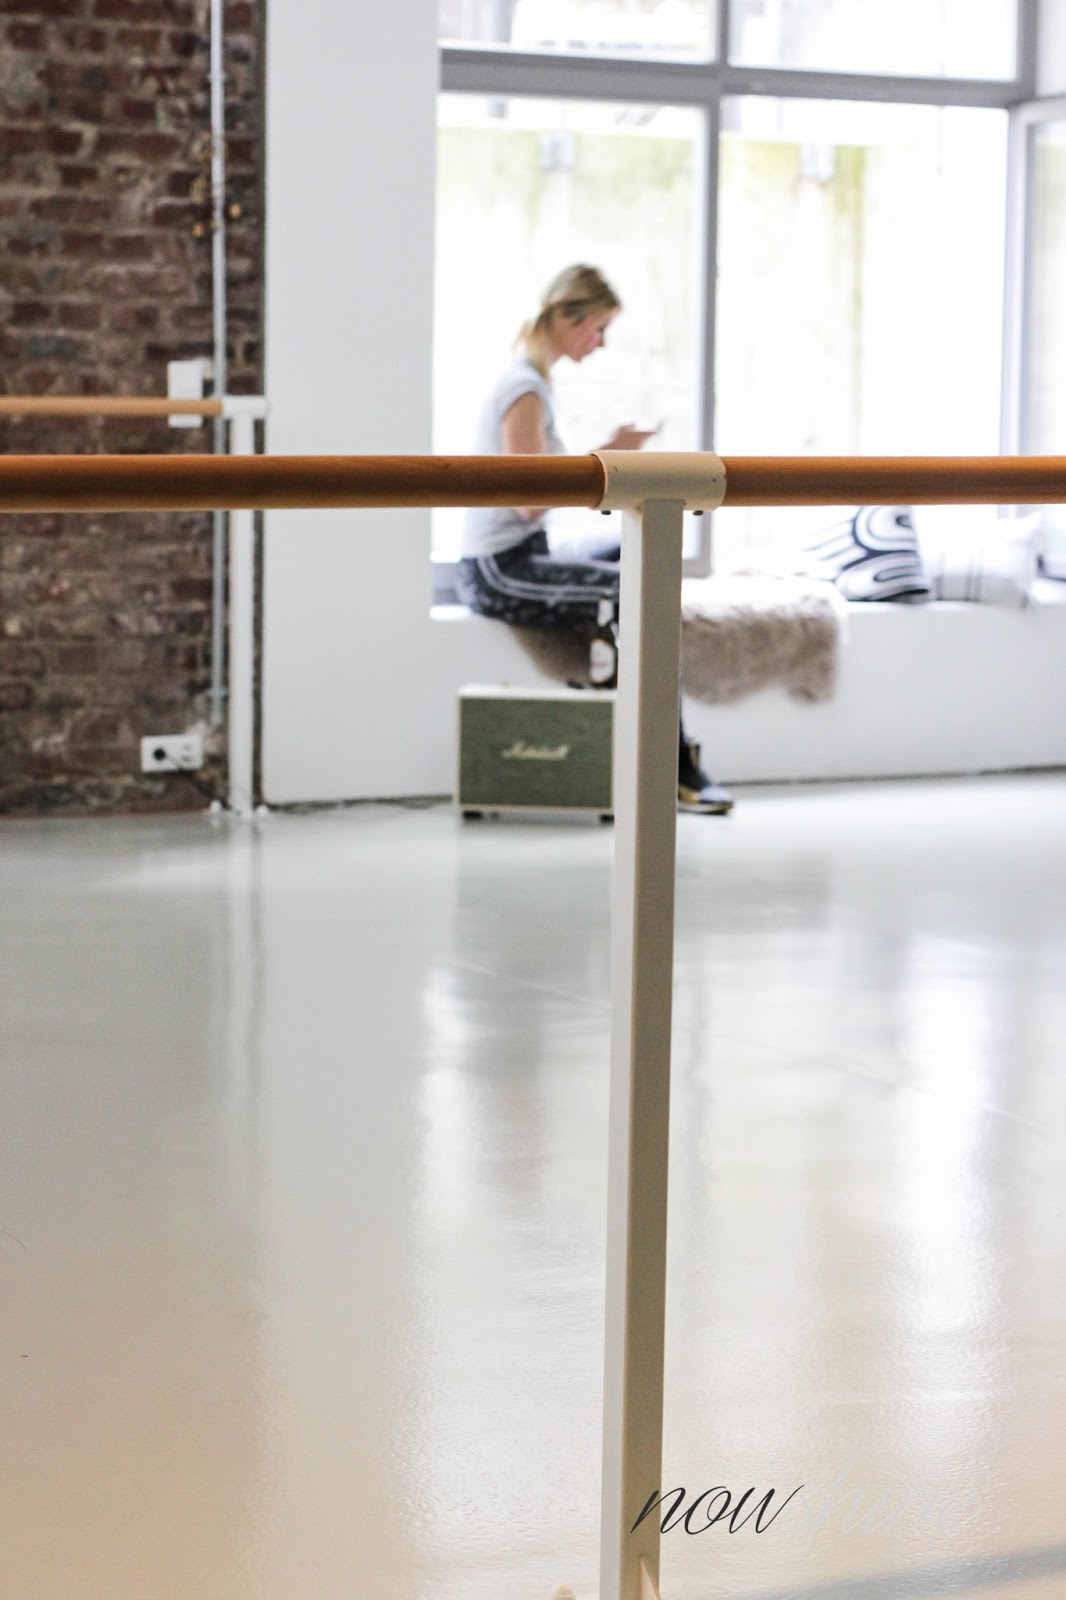 Barre Workout mit Krombacher Alkoholfrei /Cornelia Dingendorf - Youpila Düsseldorf - Nowshine ü 40 fashion, lifestyle & fitness